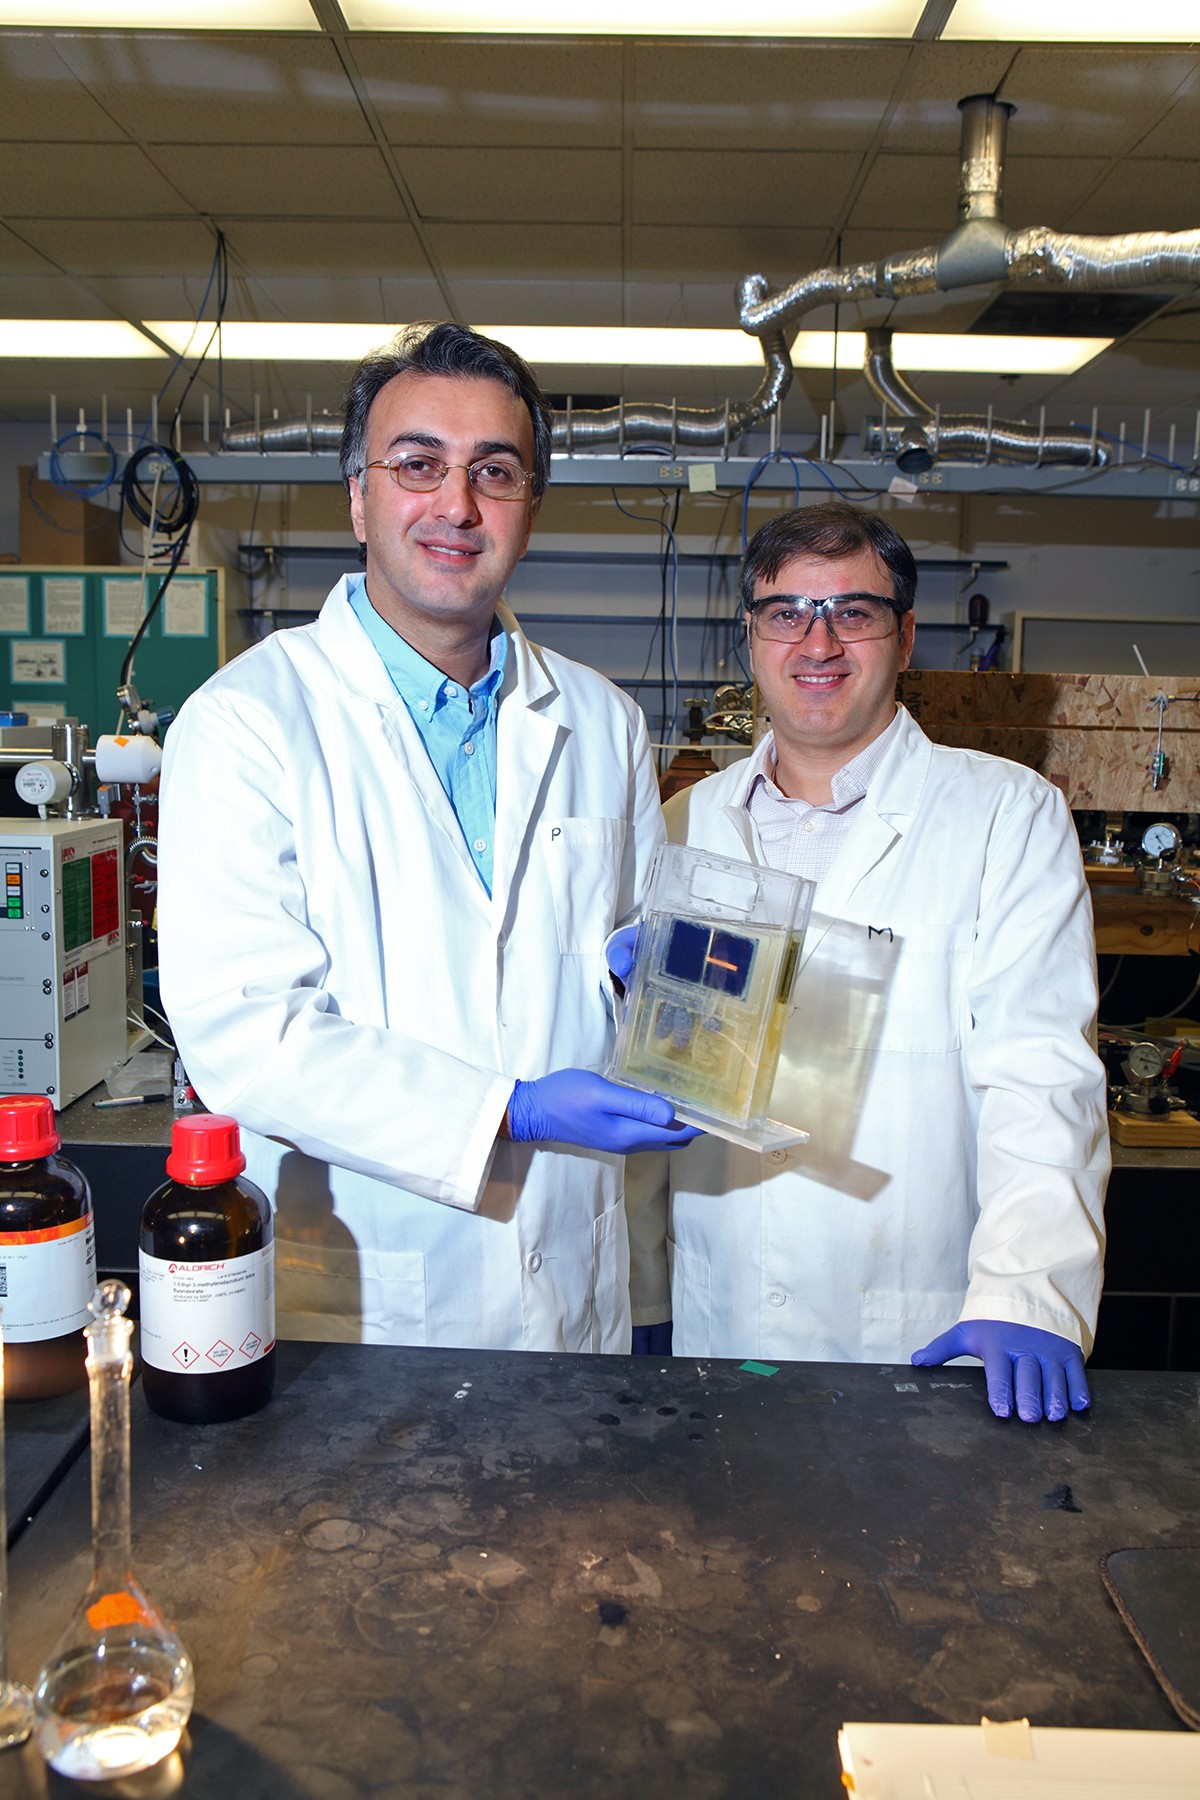 UIC 助教 Amin Salehi-Khojin (左)和博士後研究員 Mohammad Asadi 與他們的新創太陽能電池合影。圖片來源:University of Illinois